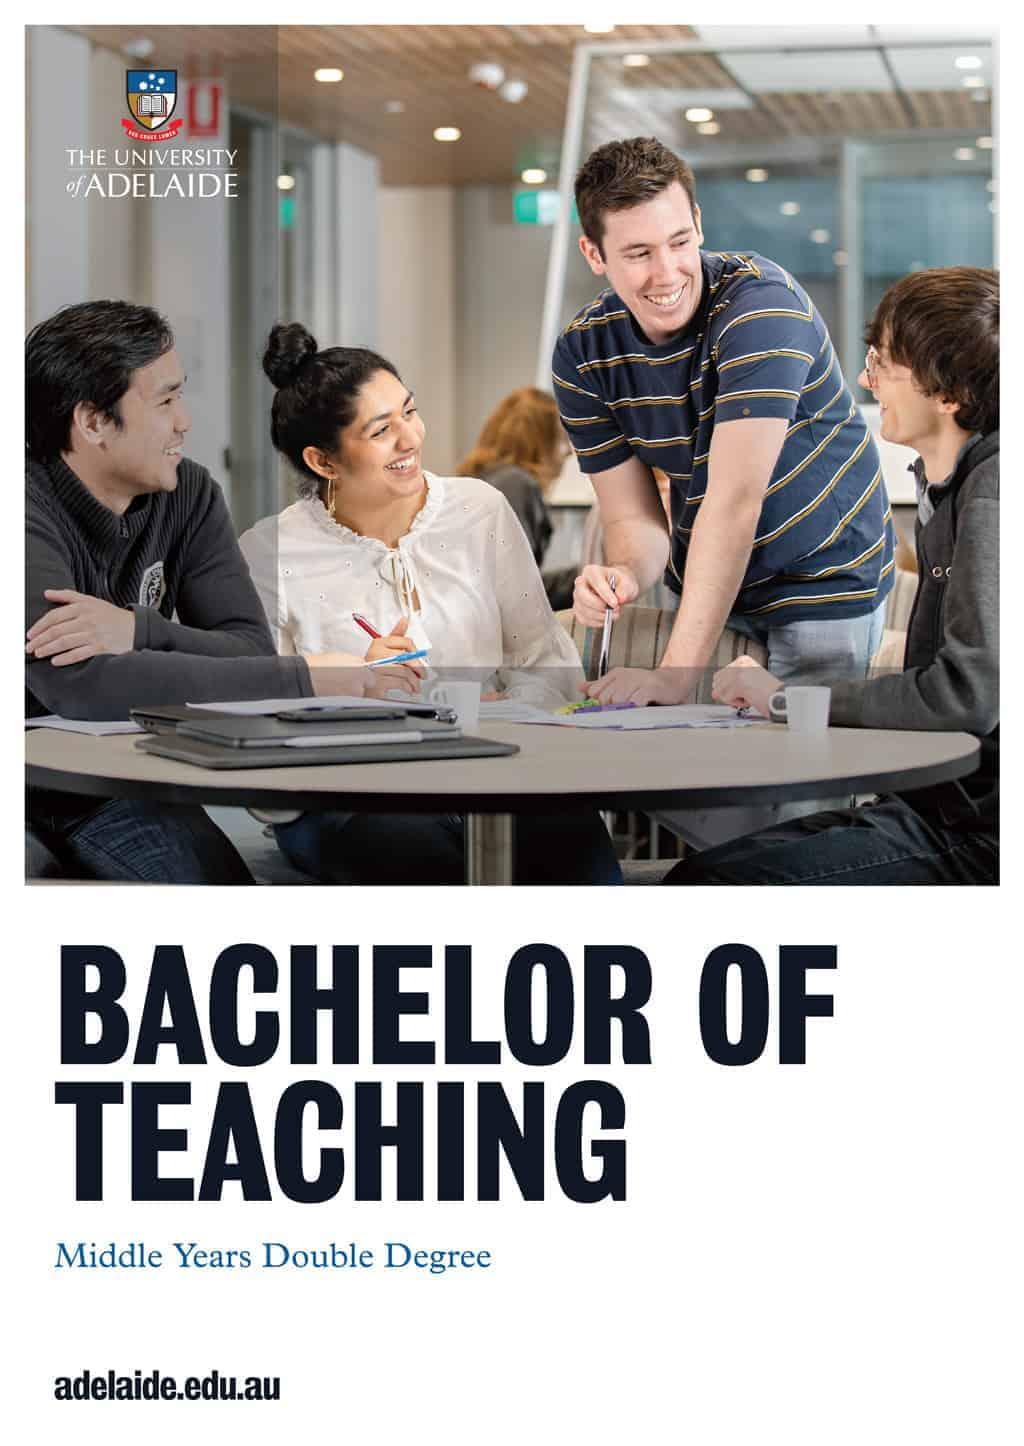 Bachelor of Teaching Advertising Photographer Adelaide